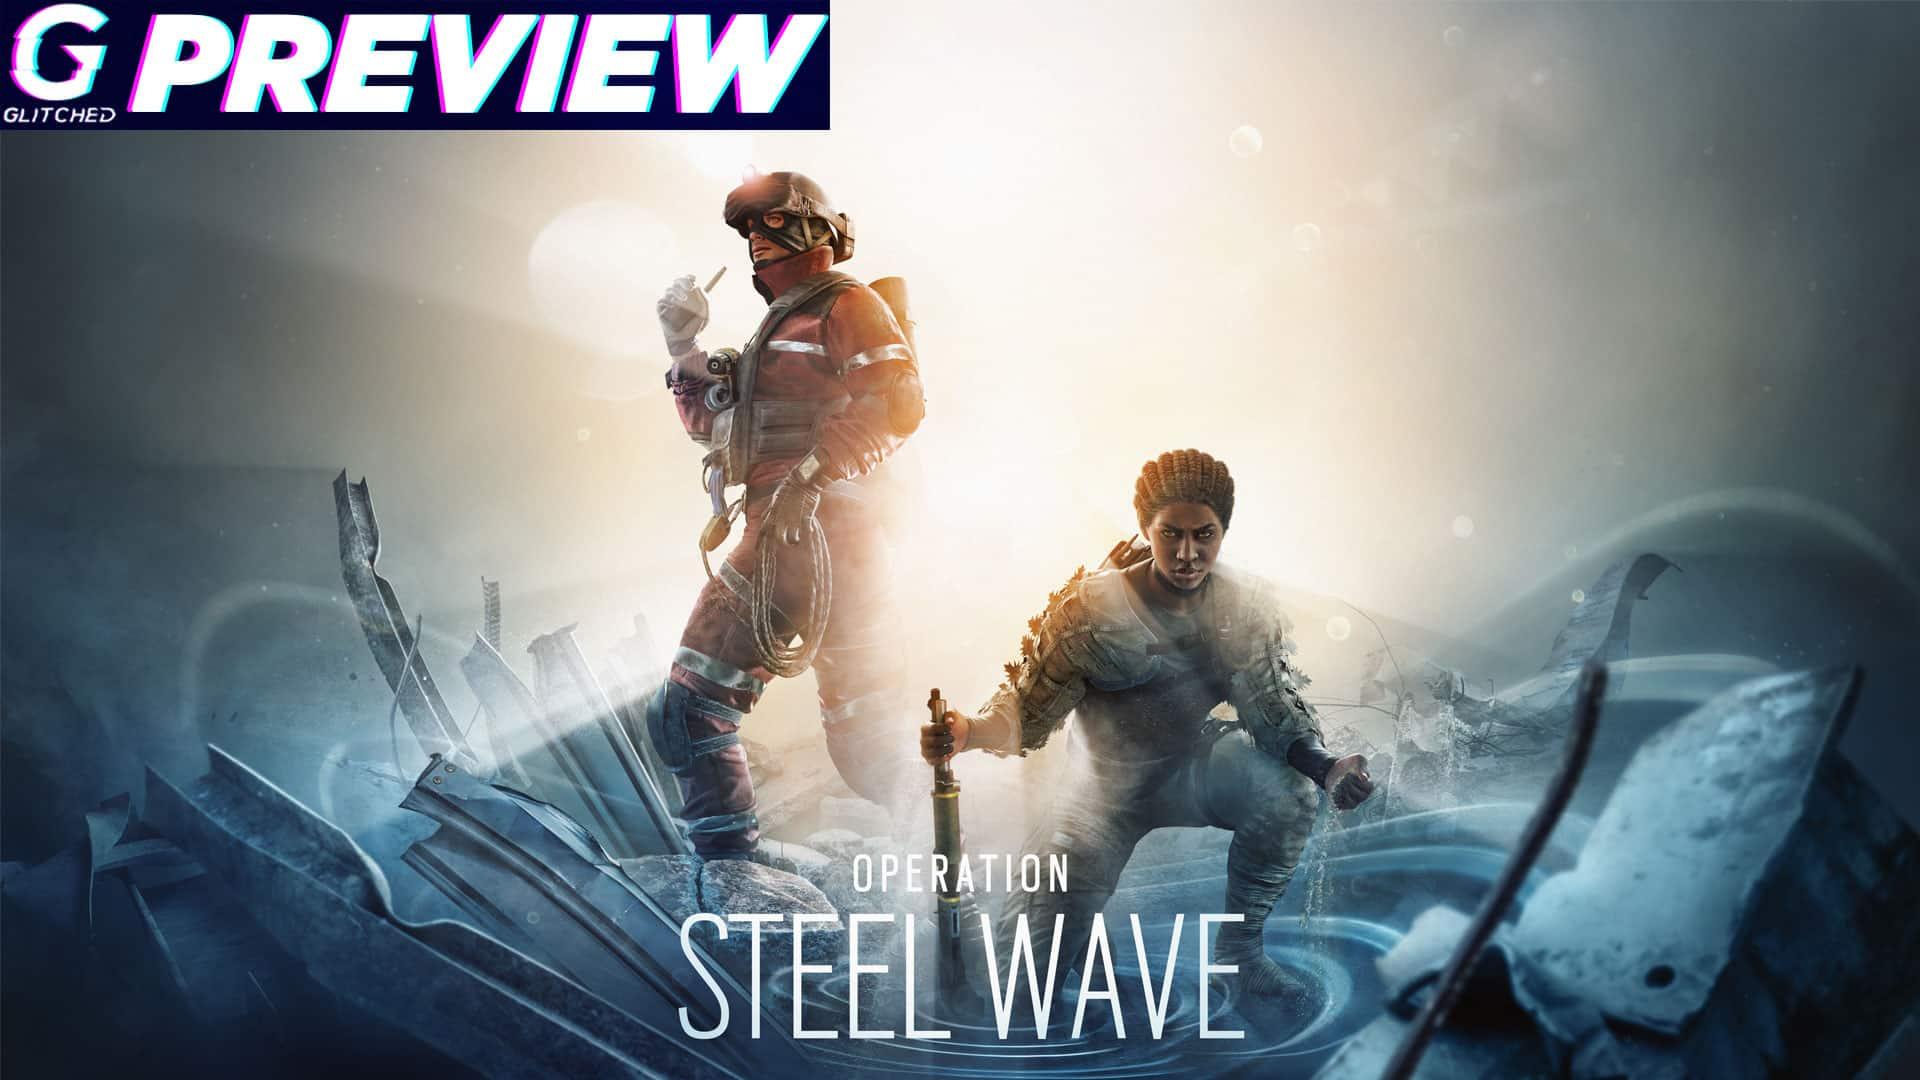 Rainbow Six Siege South African Operator Operation Steel Wave